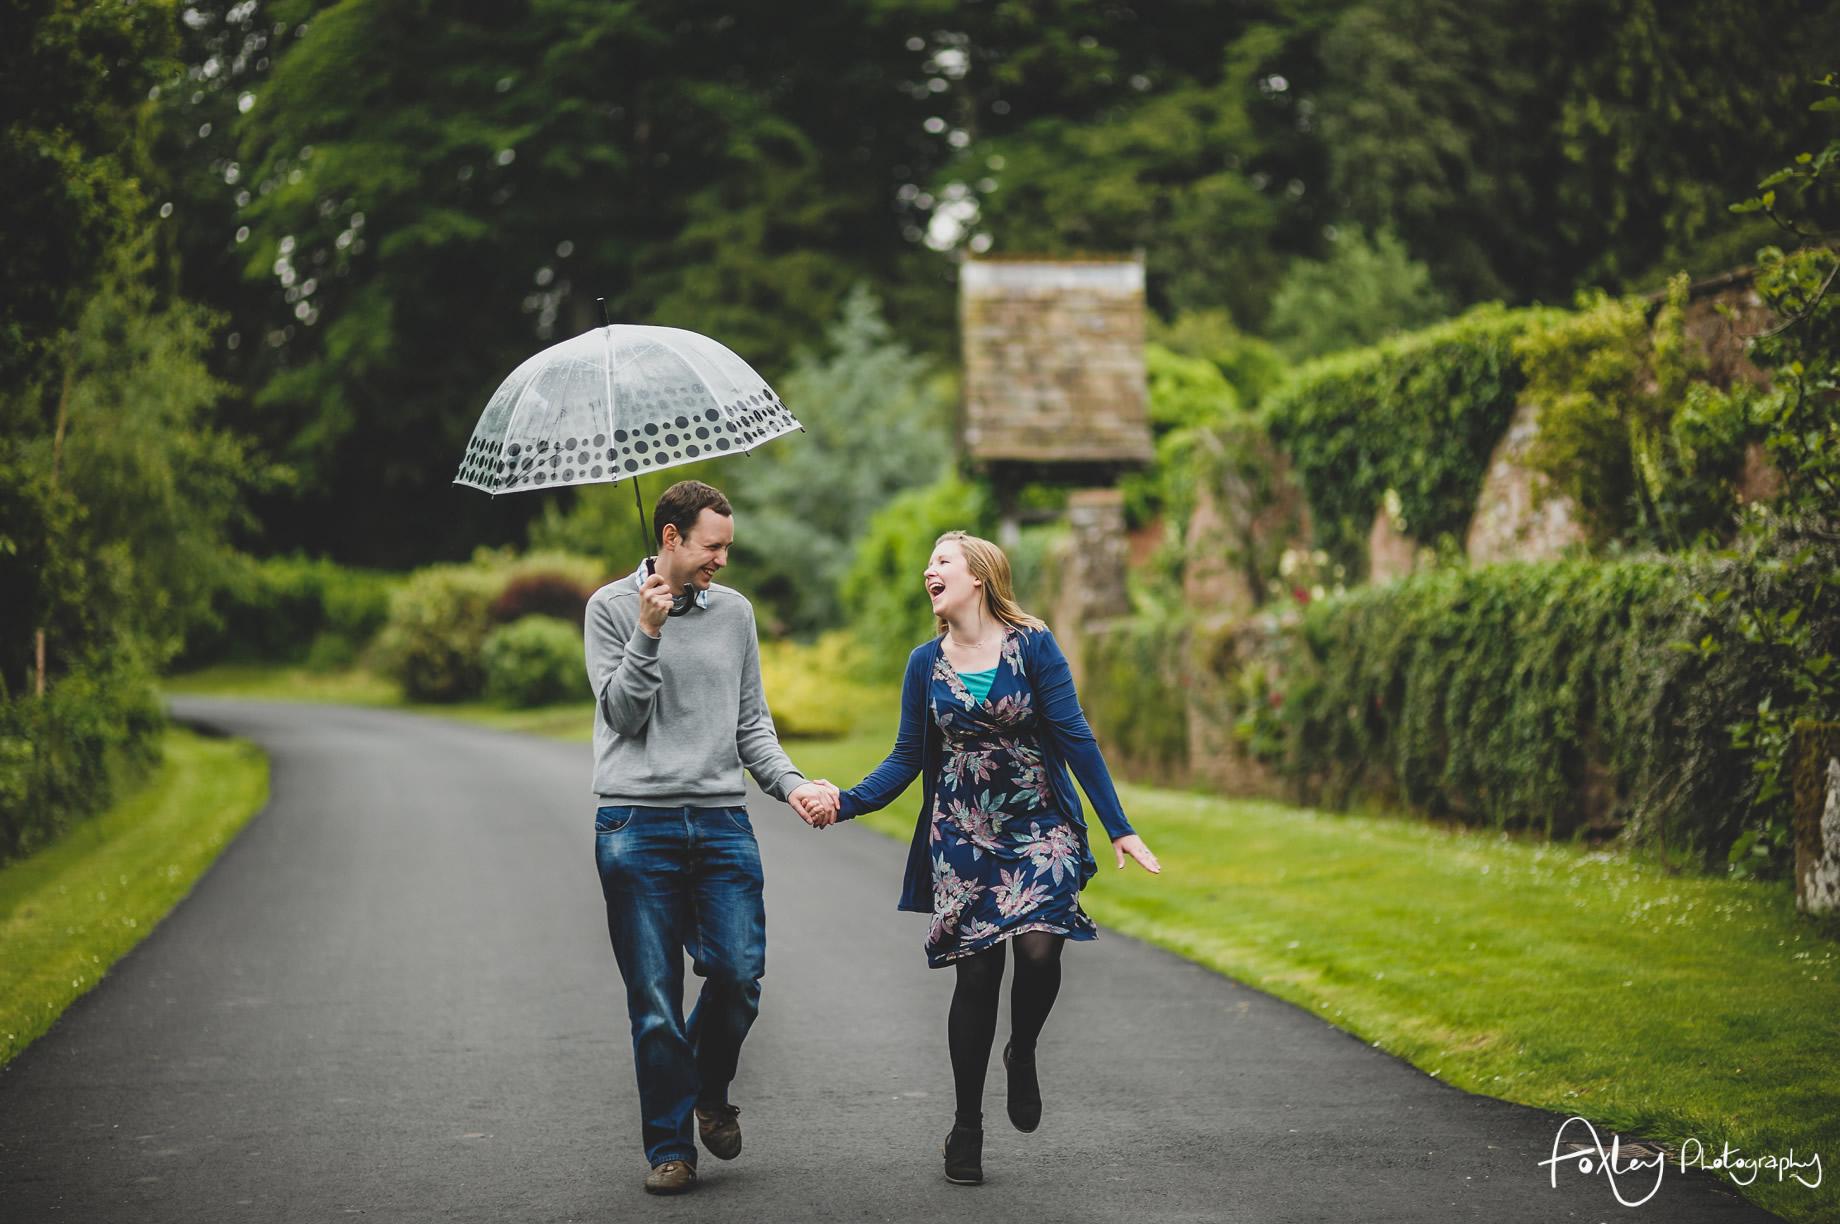 Rachel-and-Steve-Pre-Wedding-Shoot-at-The-How-Caple-Court-026